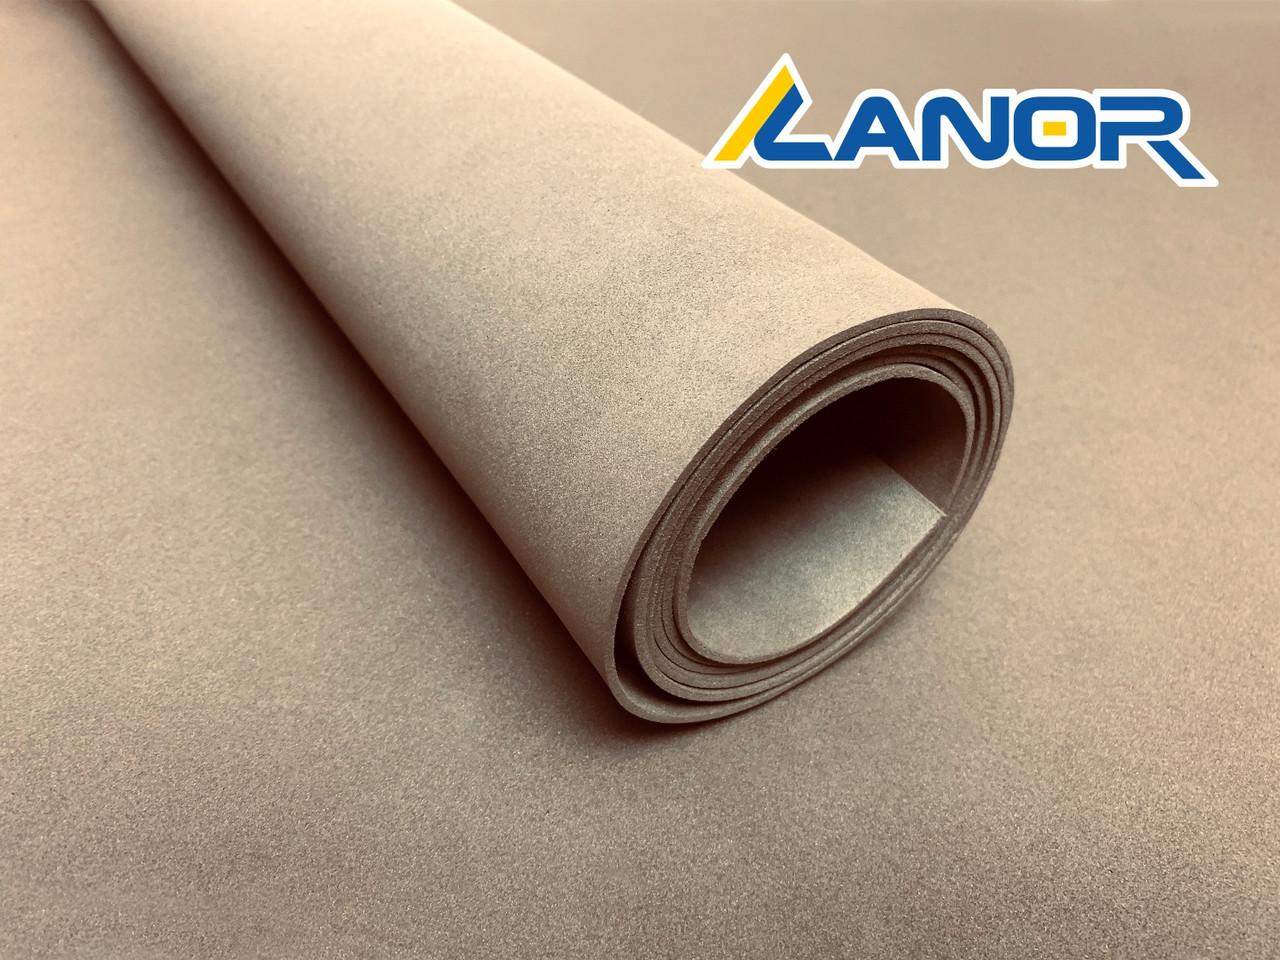 Lanor EVA 0075 лист 100*150см (3мм) Коричневый